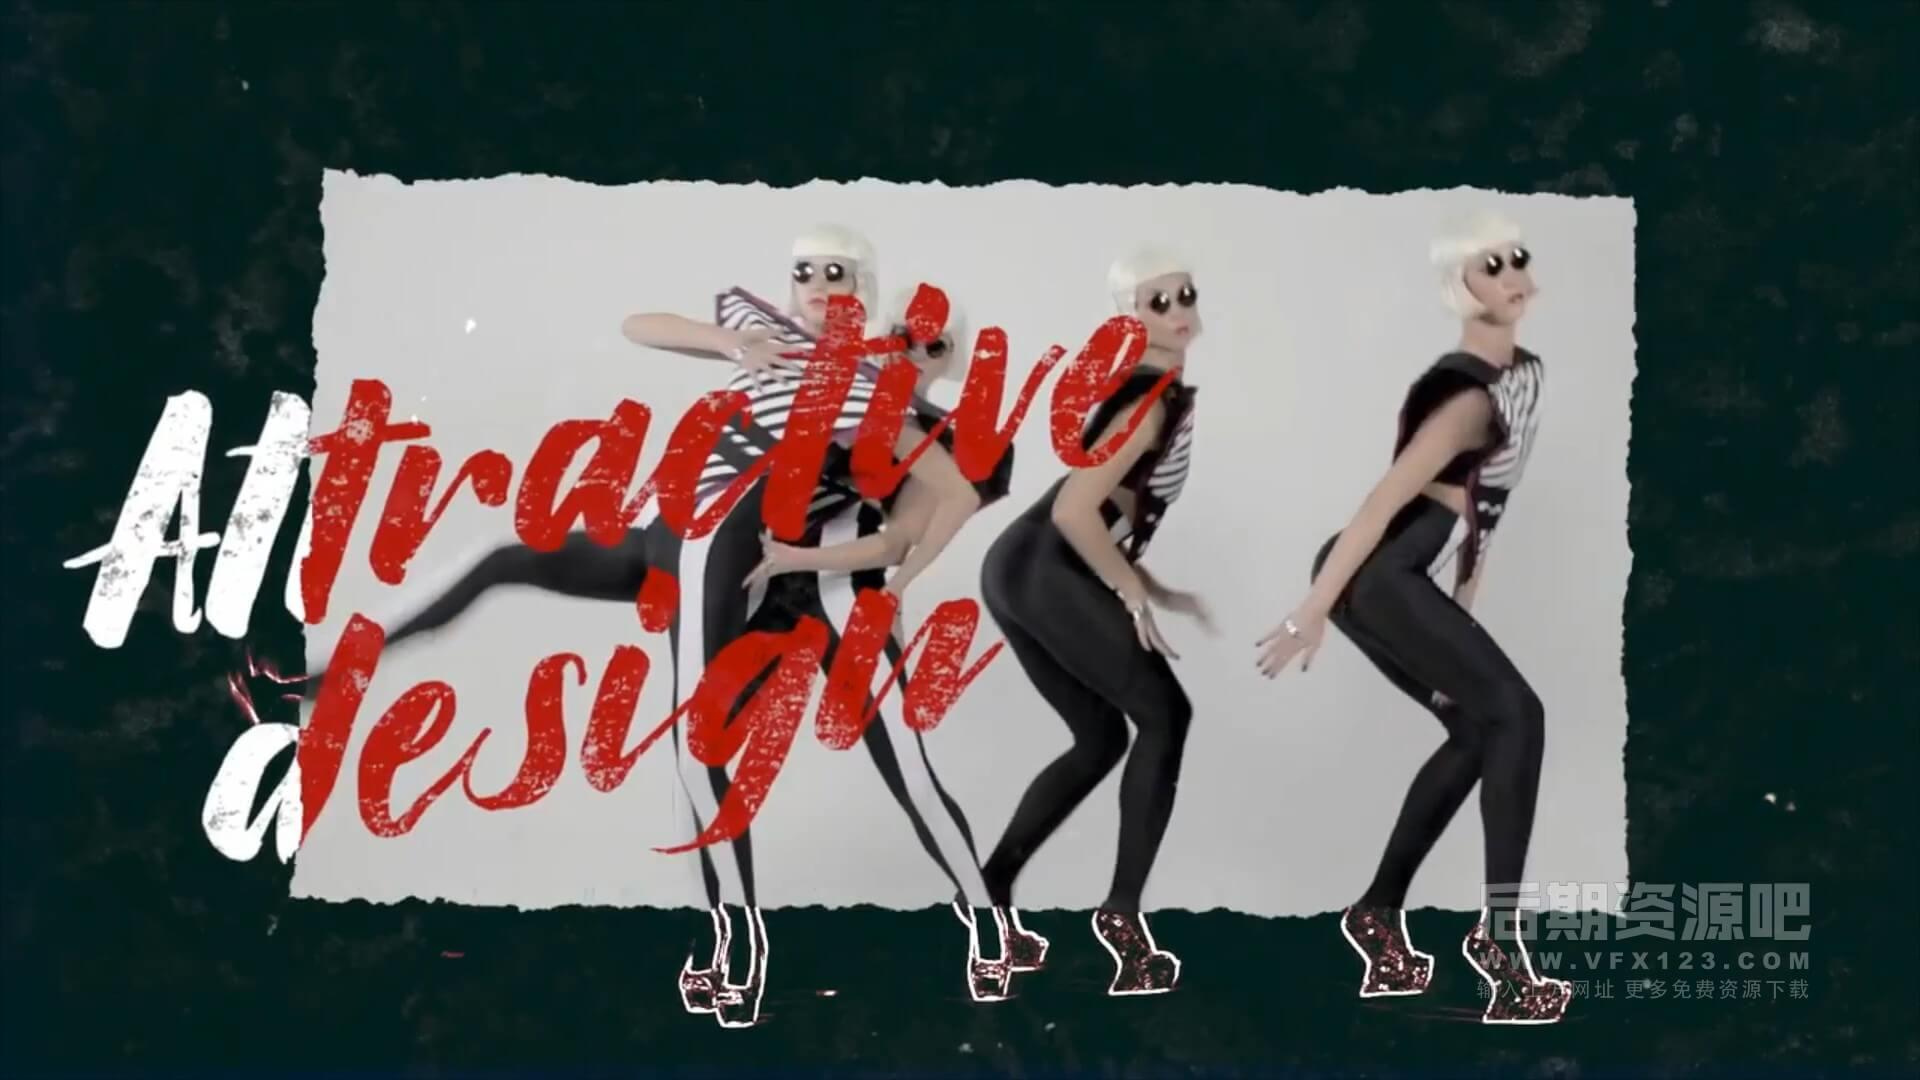 fcpx主题插件 动感活泼现代城市风格跳帧效果片头模板 Urban Style Promo